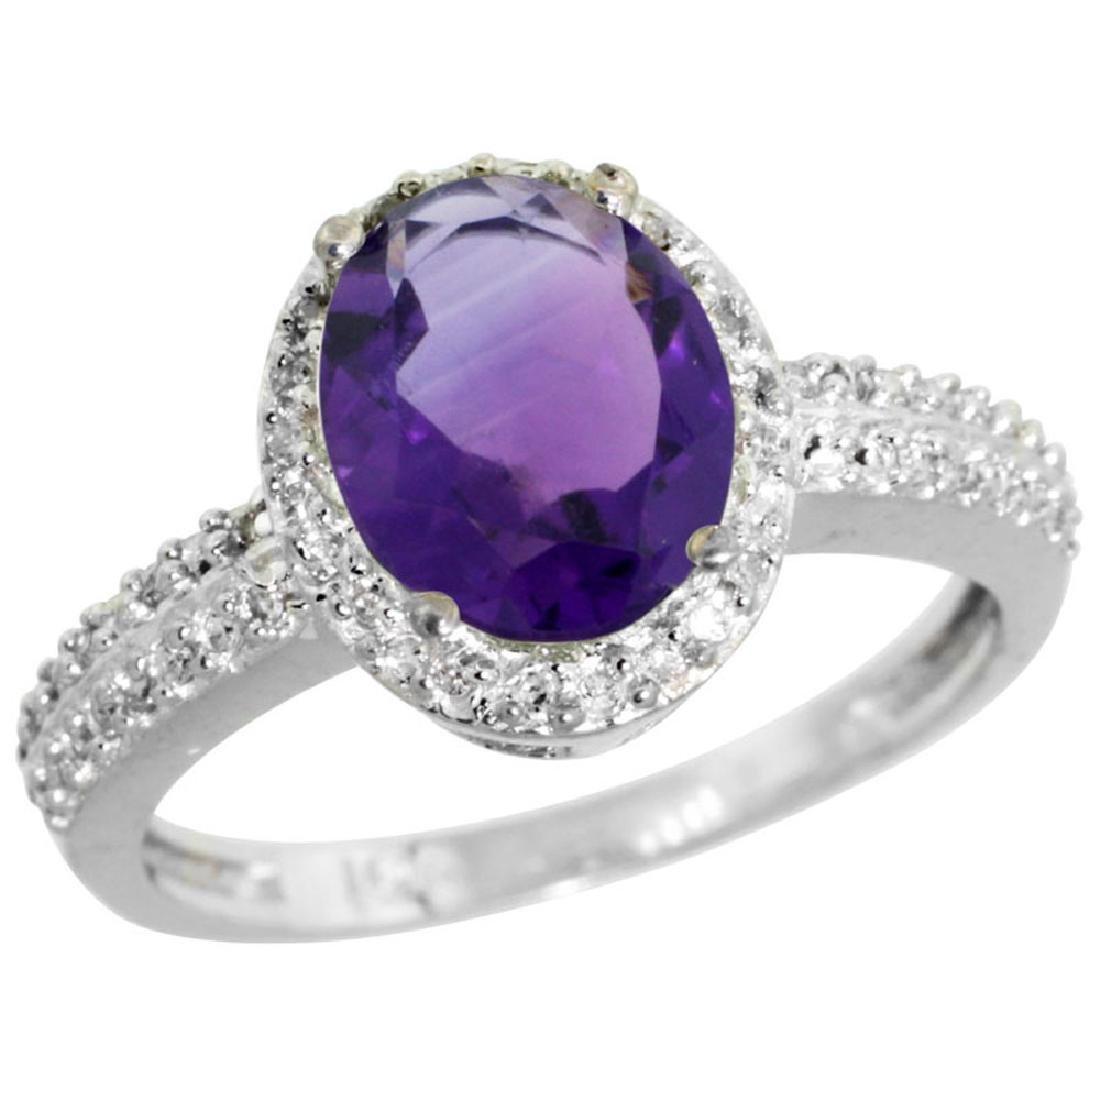 Natural 1.91 ctw Amethyst & Diamond Engagement Ring 14K